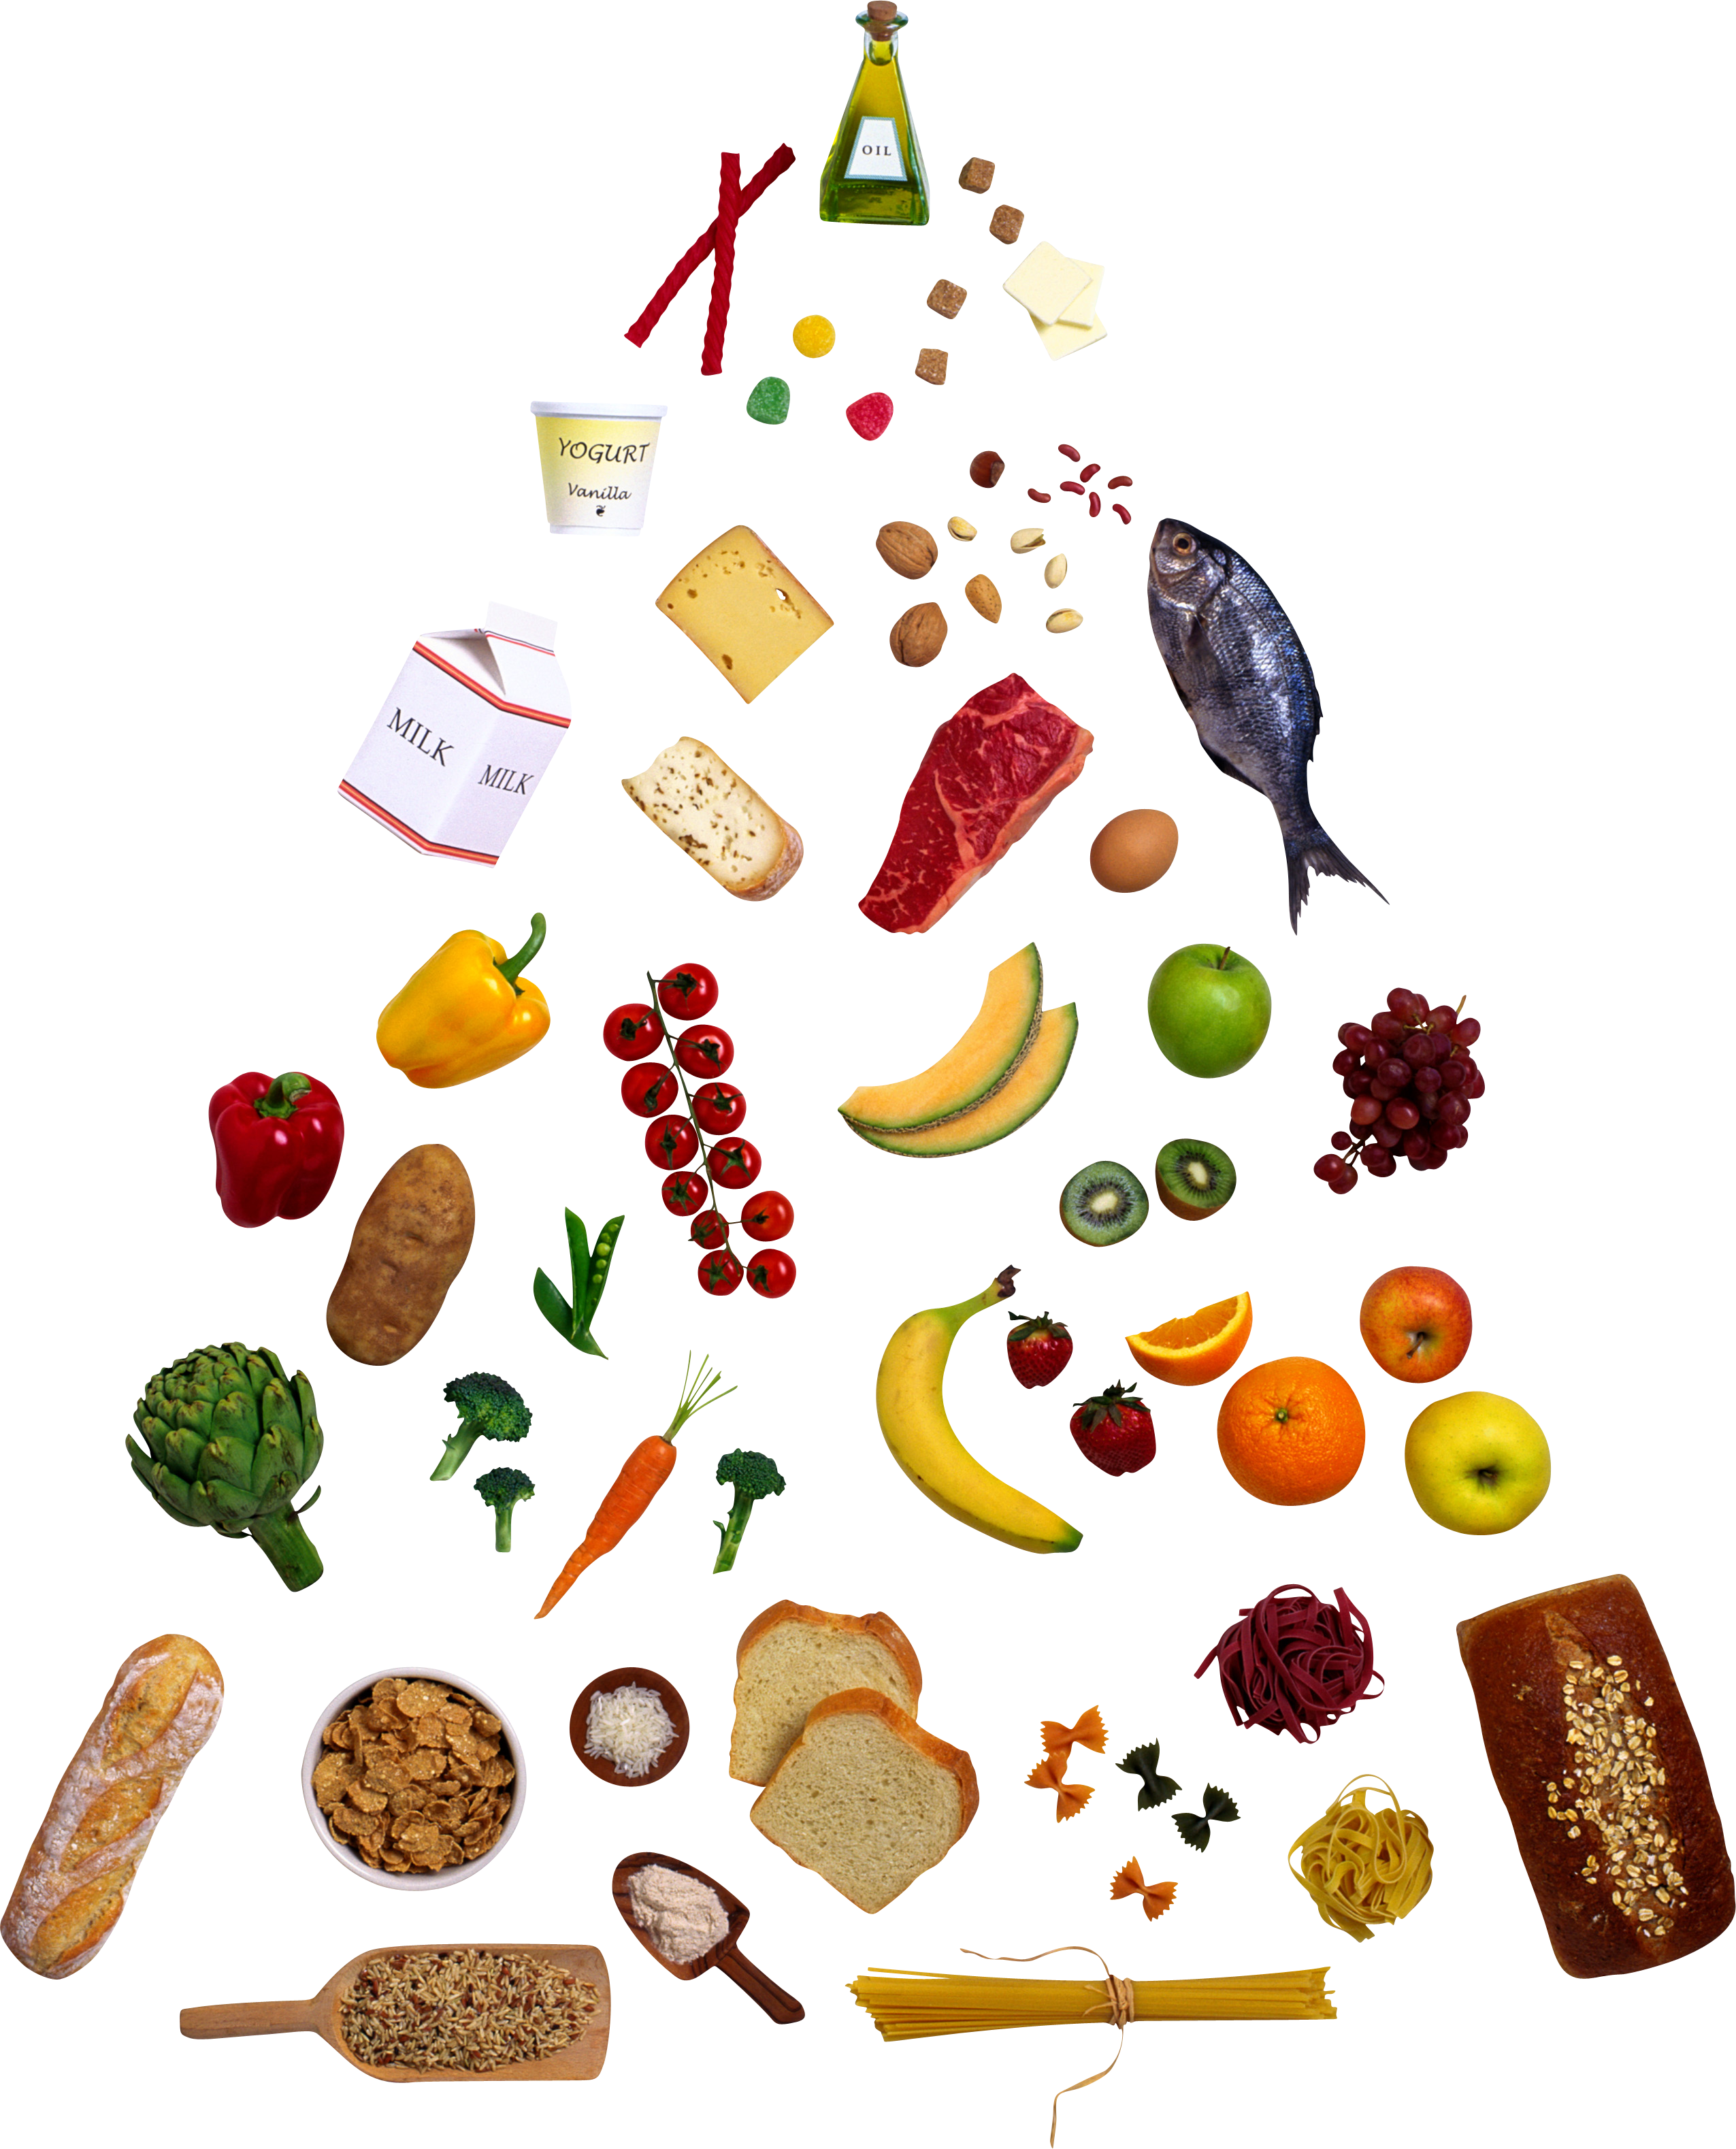 Food Pyramid Clip Art-Food Pyramid Clip Art-12